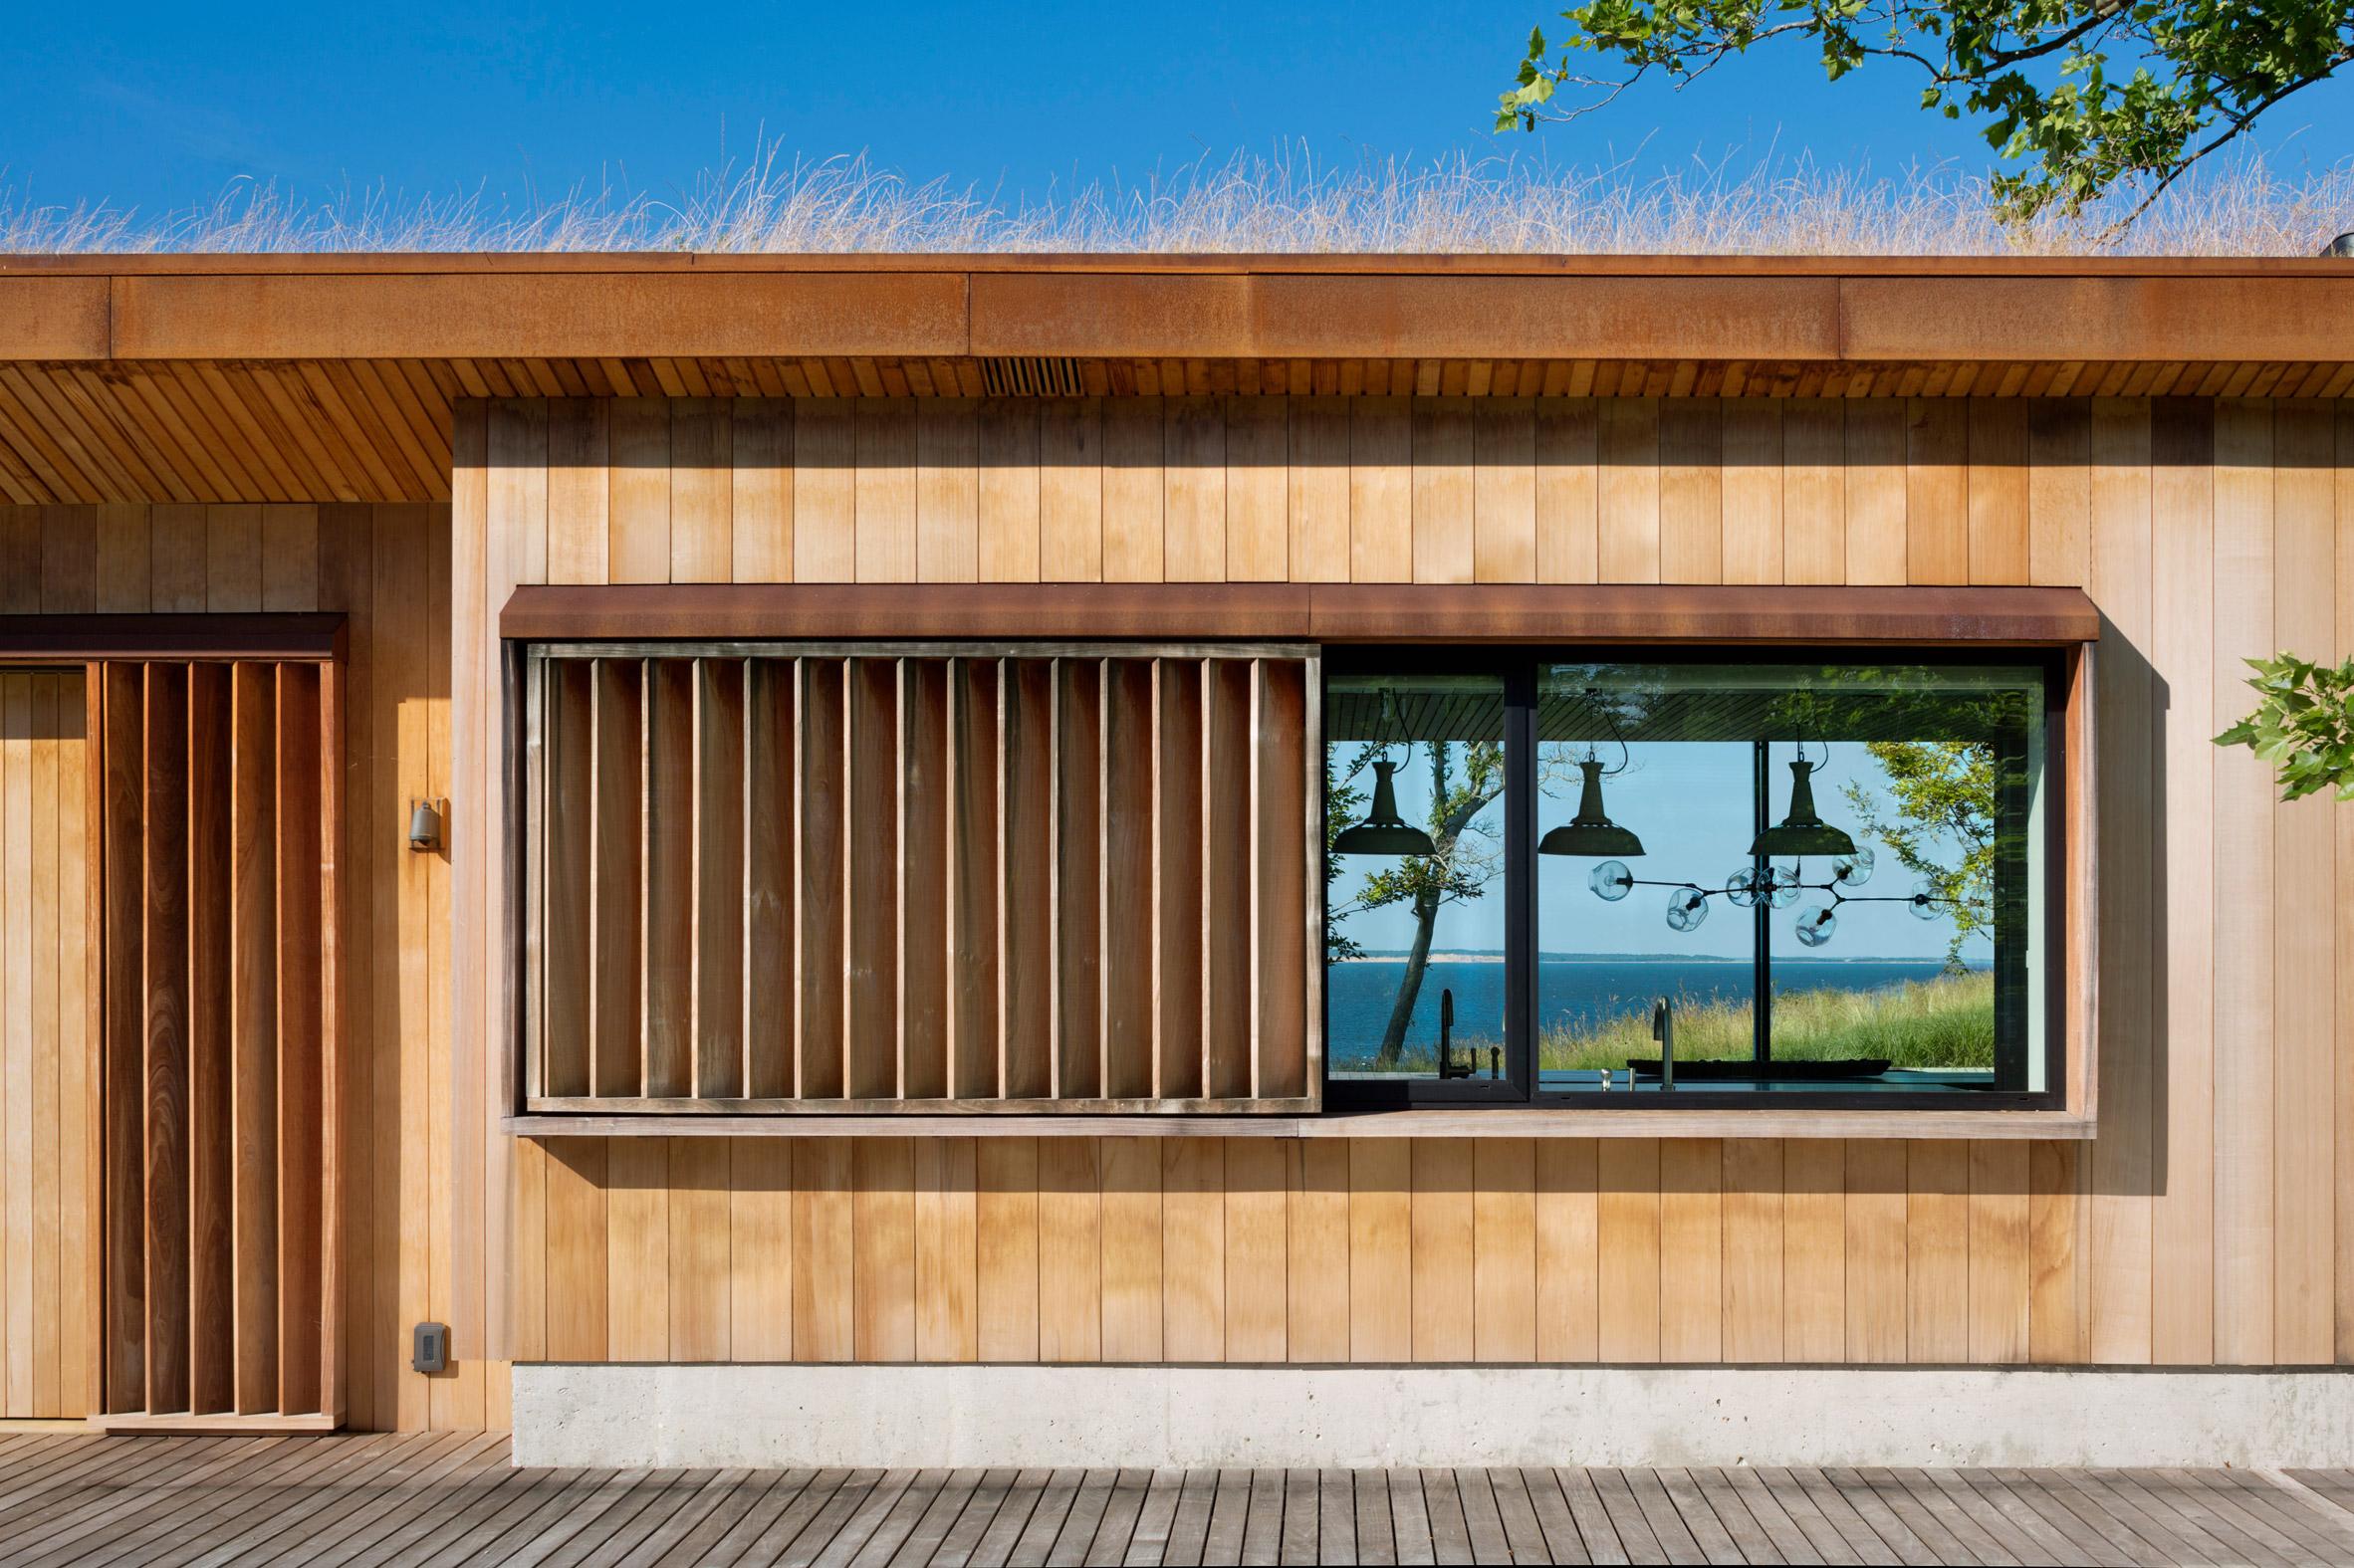 peconic-house-mapos-studio-hamptons-long-island-new-york_dezeen_2364_col_8.jpg